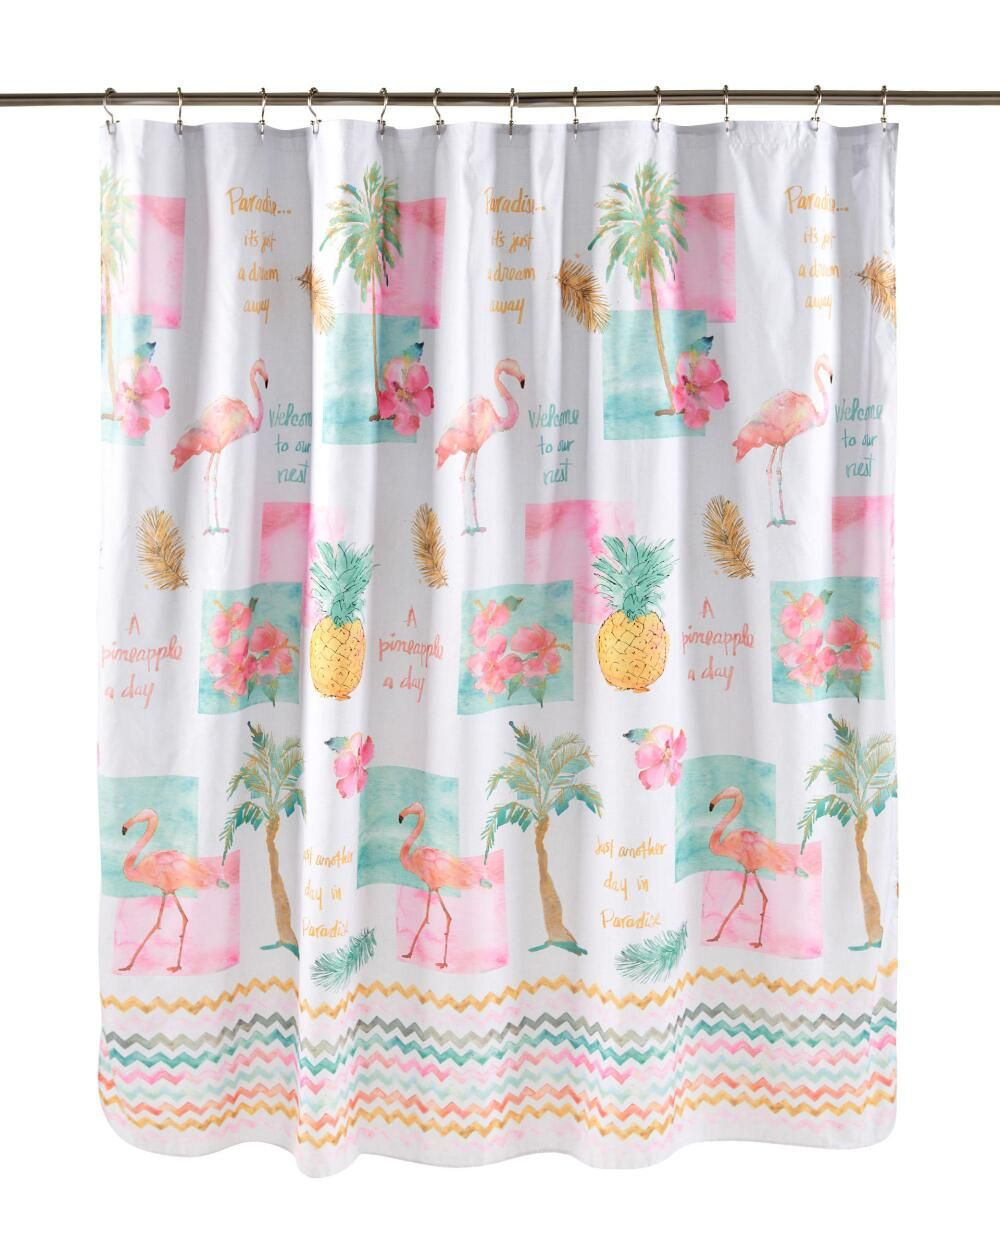 Flamingo Fever Fabric Shower Curtain Fabric Shower Curtains